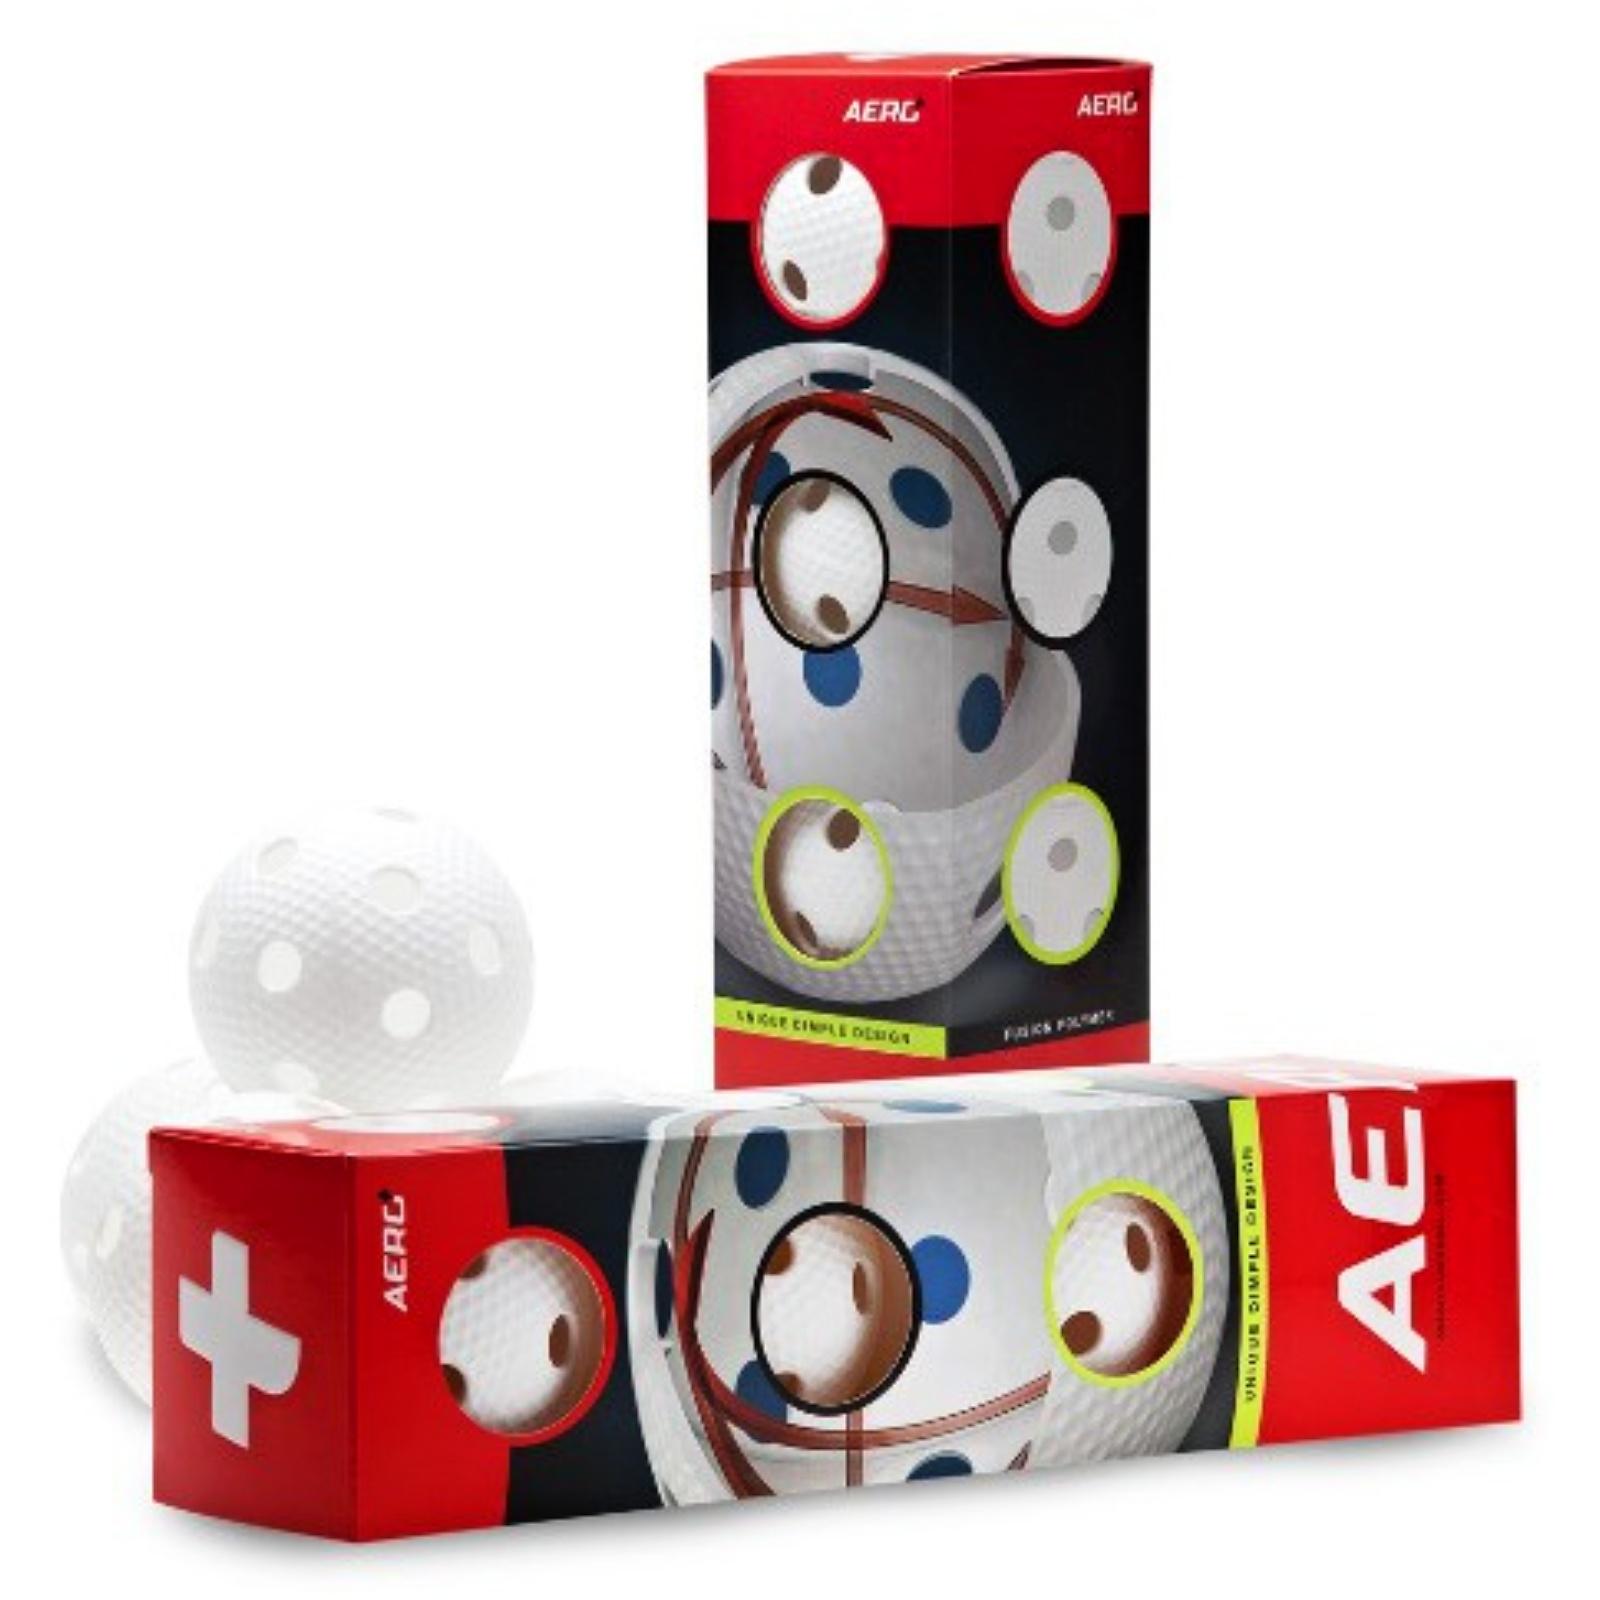 Florbalový míček SALMING Aero Plus Ball 4 ks, bílý